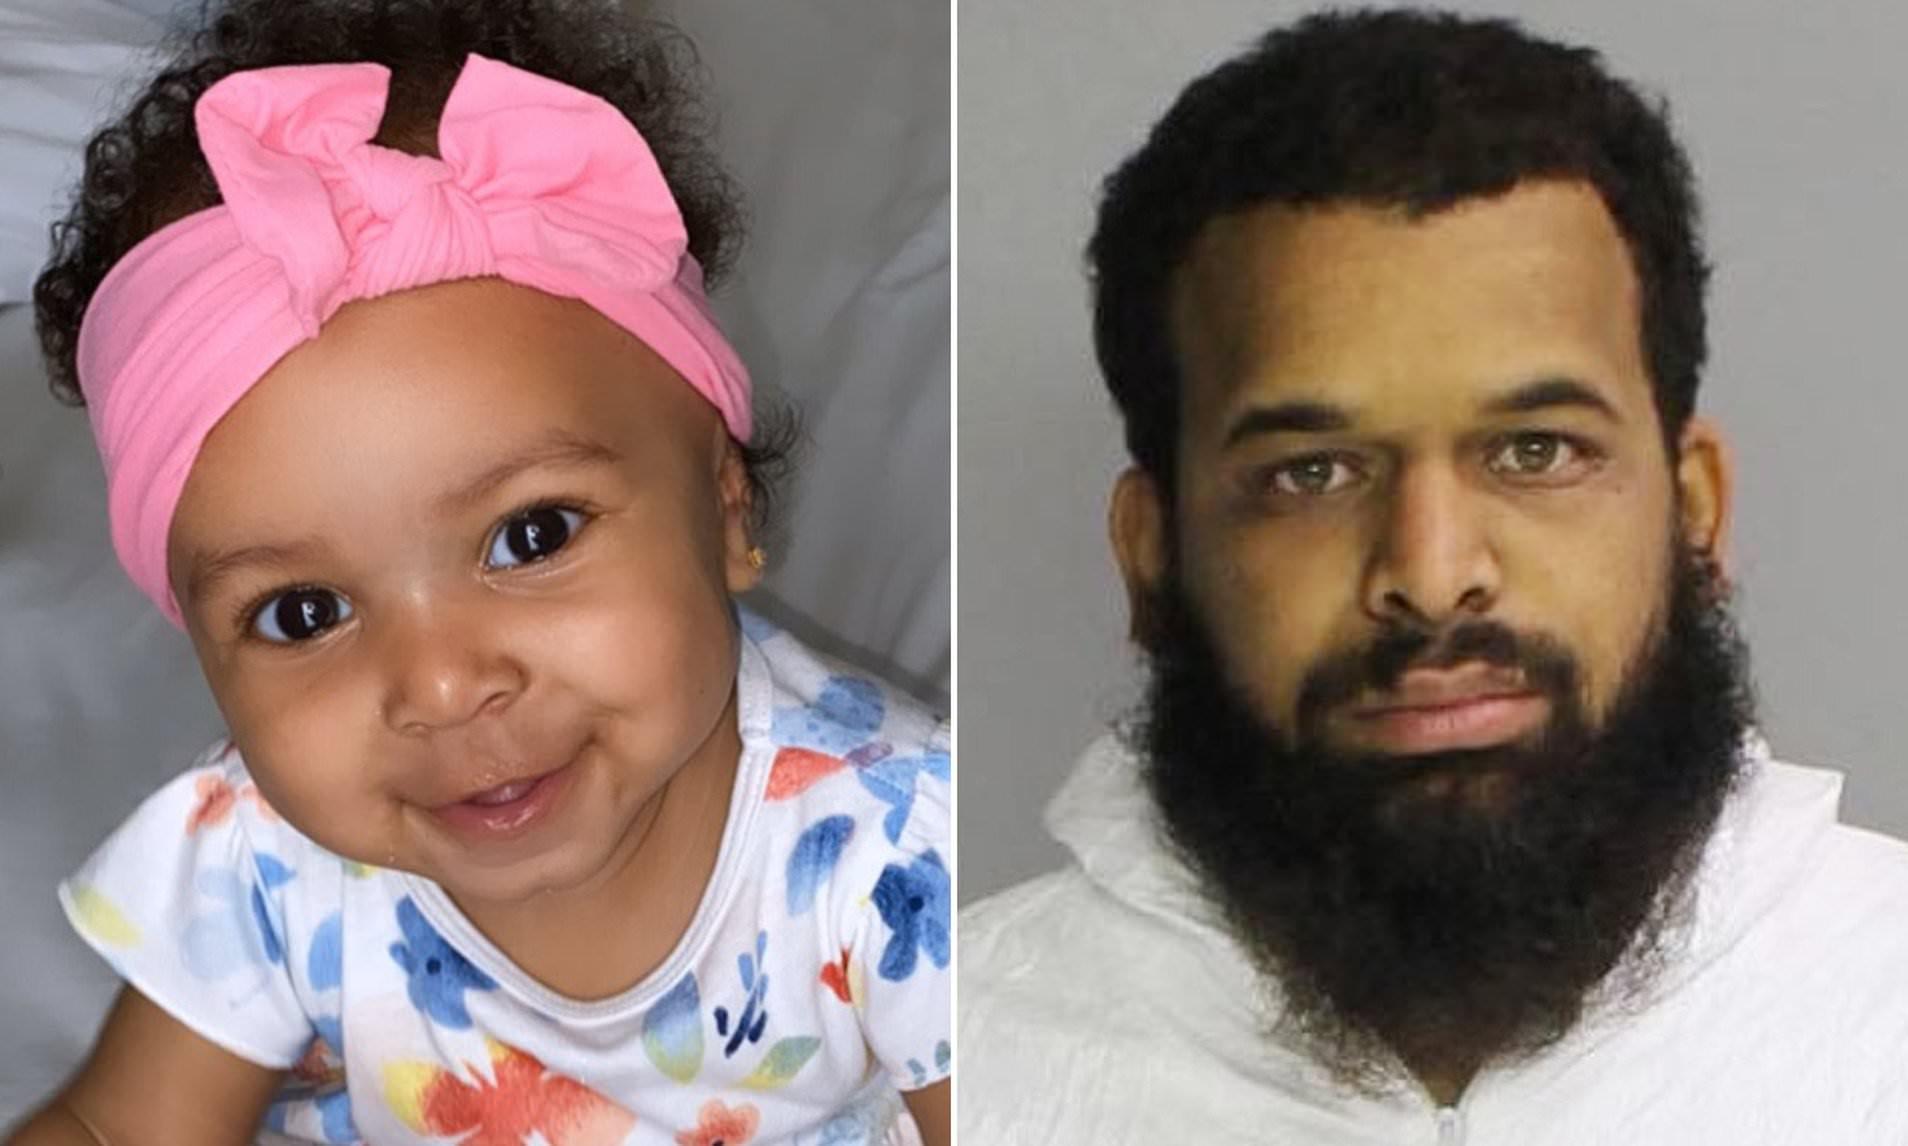 Ten-month-old girl dies